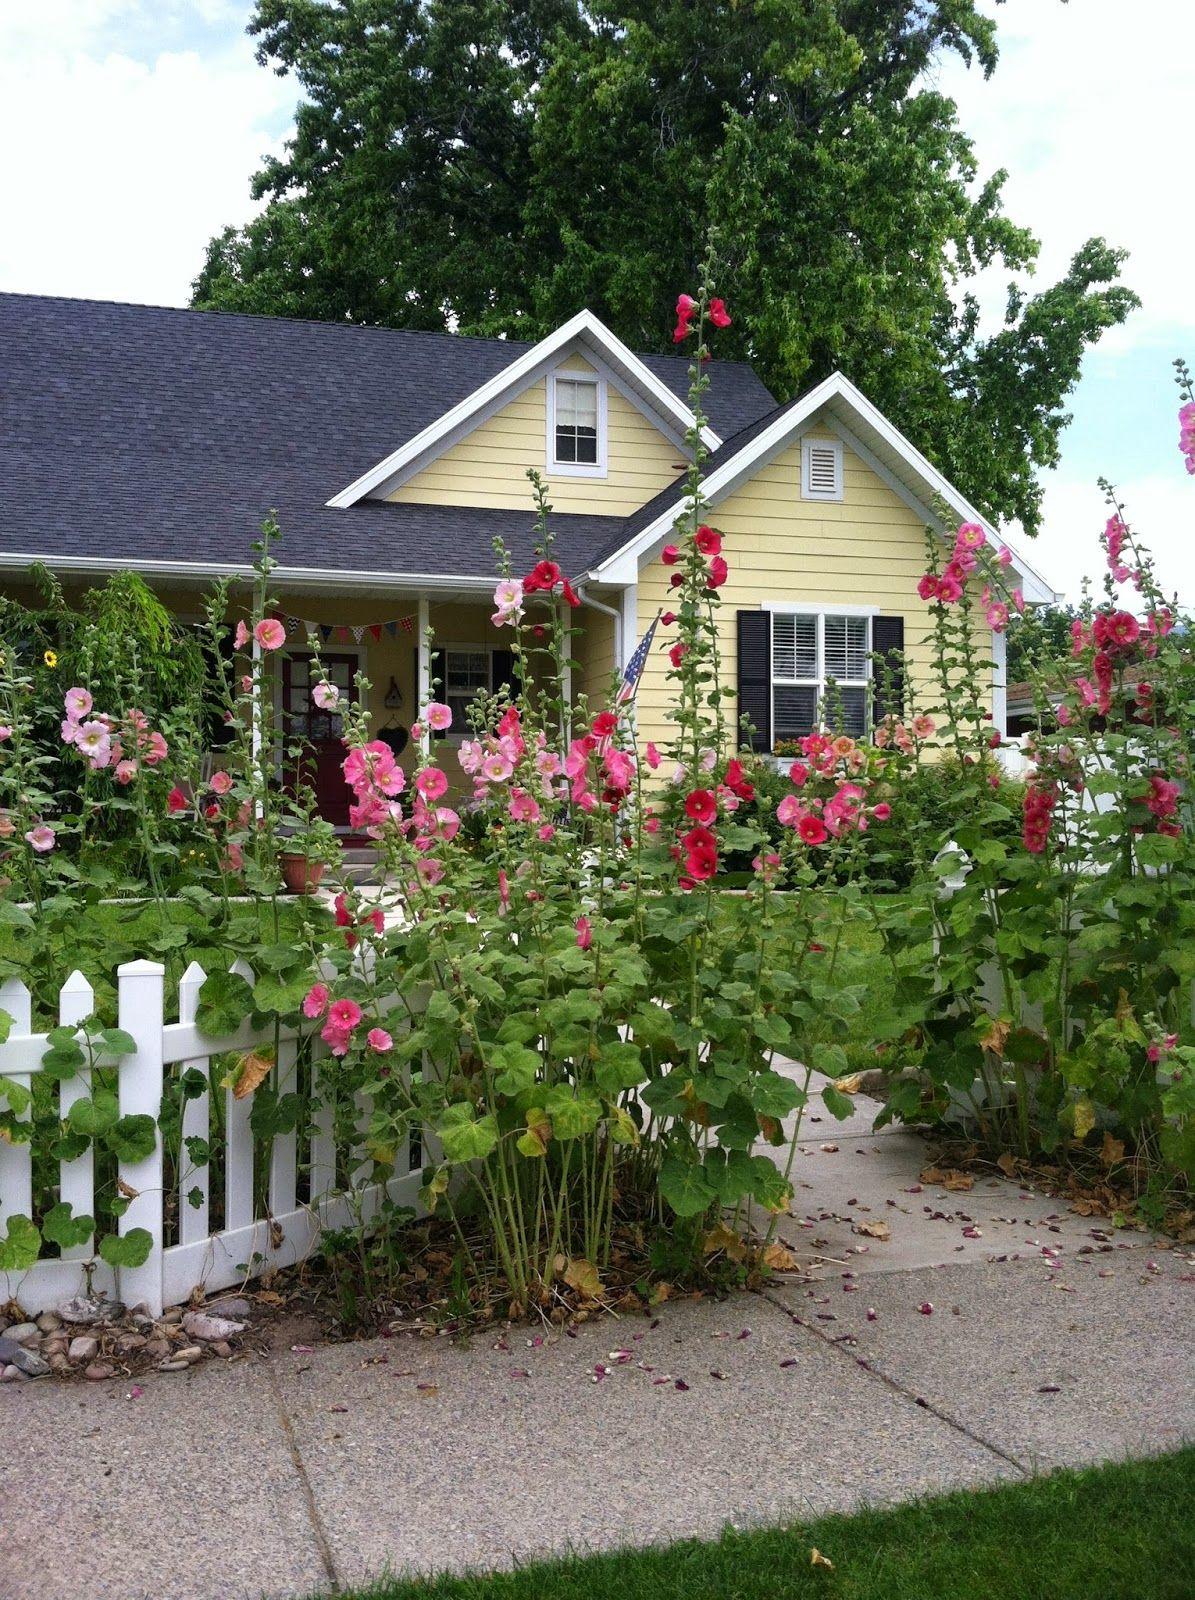 Surprising Mimi Sues Cottage Summer Fun Very Pretty Cottage Download Free Architecture Designs Scobabritishbridgeorg